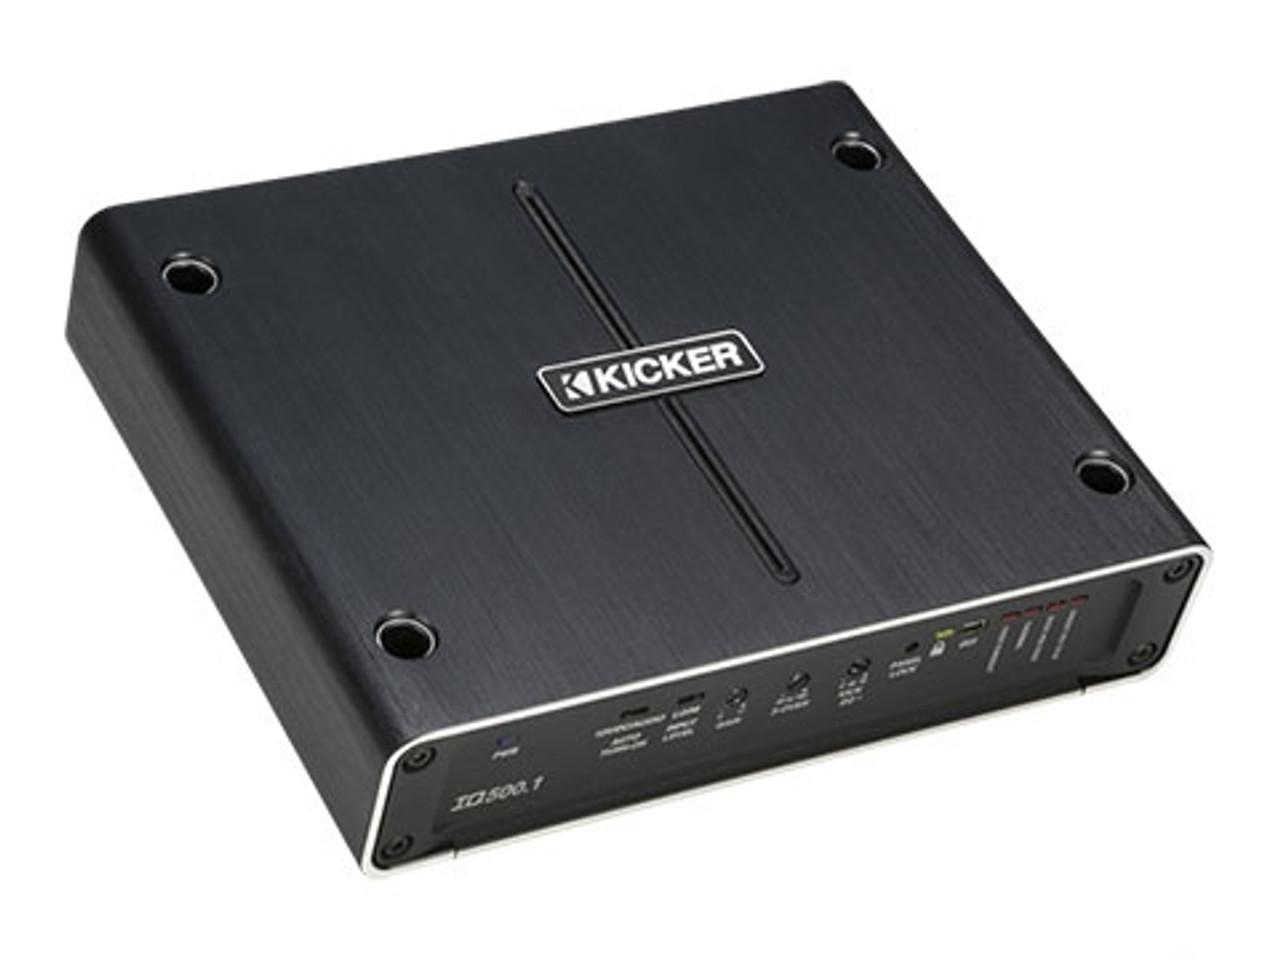 KICKER IQ500.1 Mono Class Amplifier